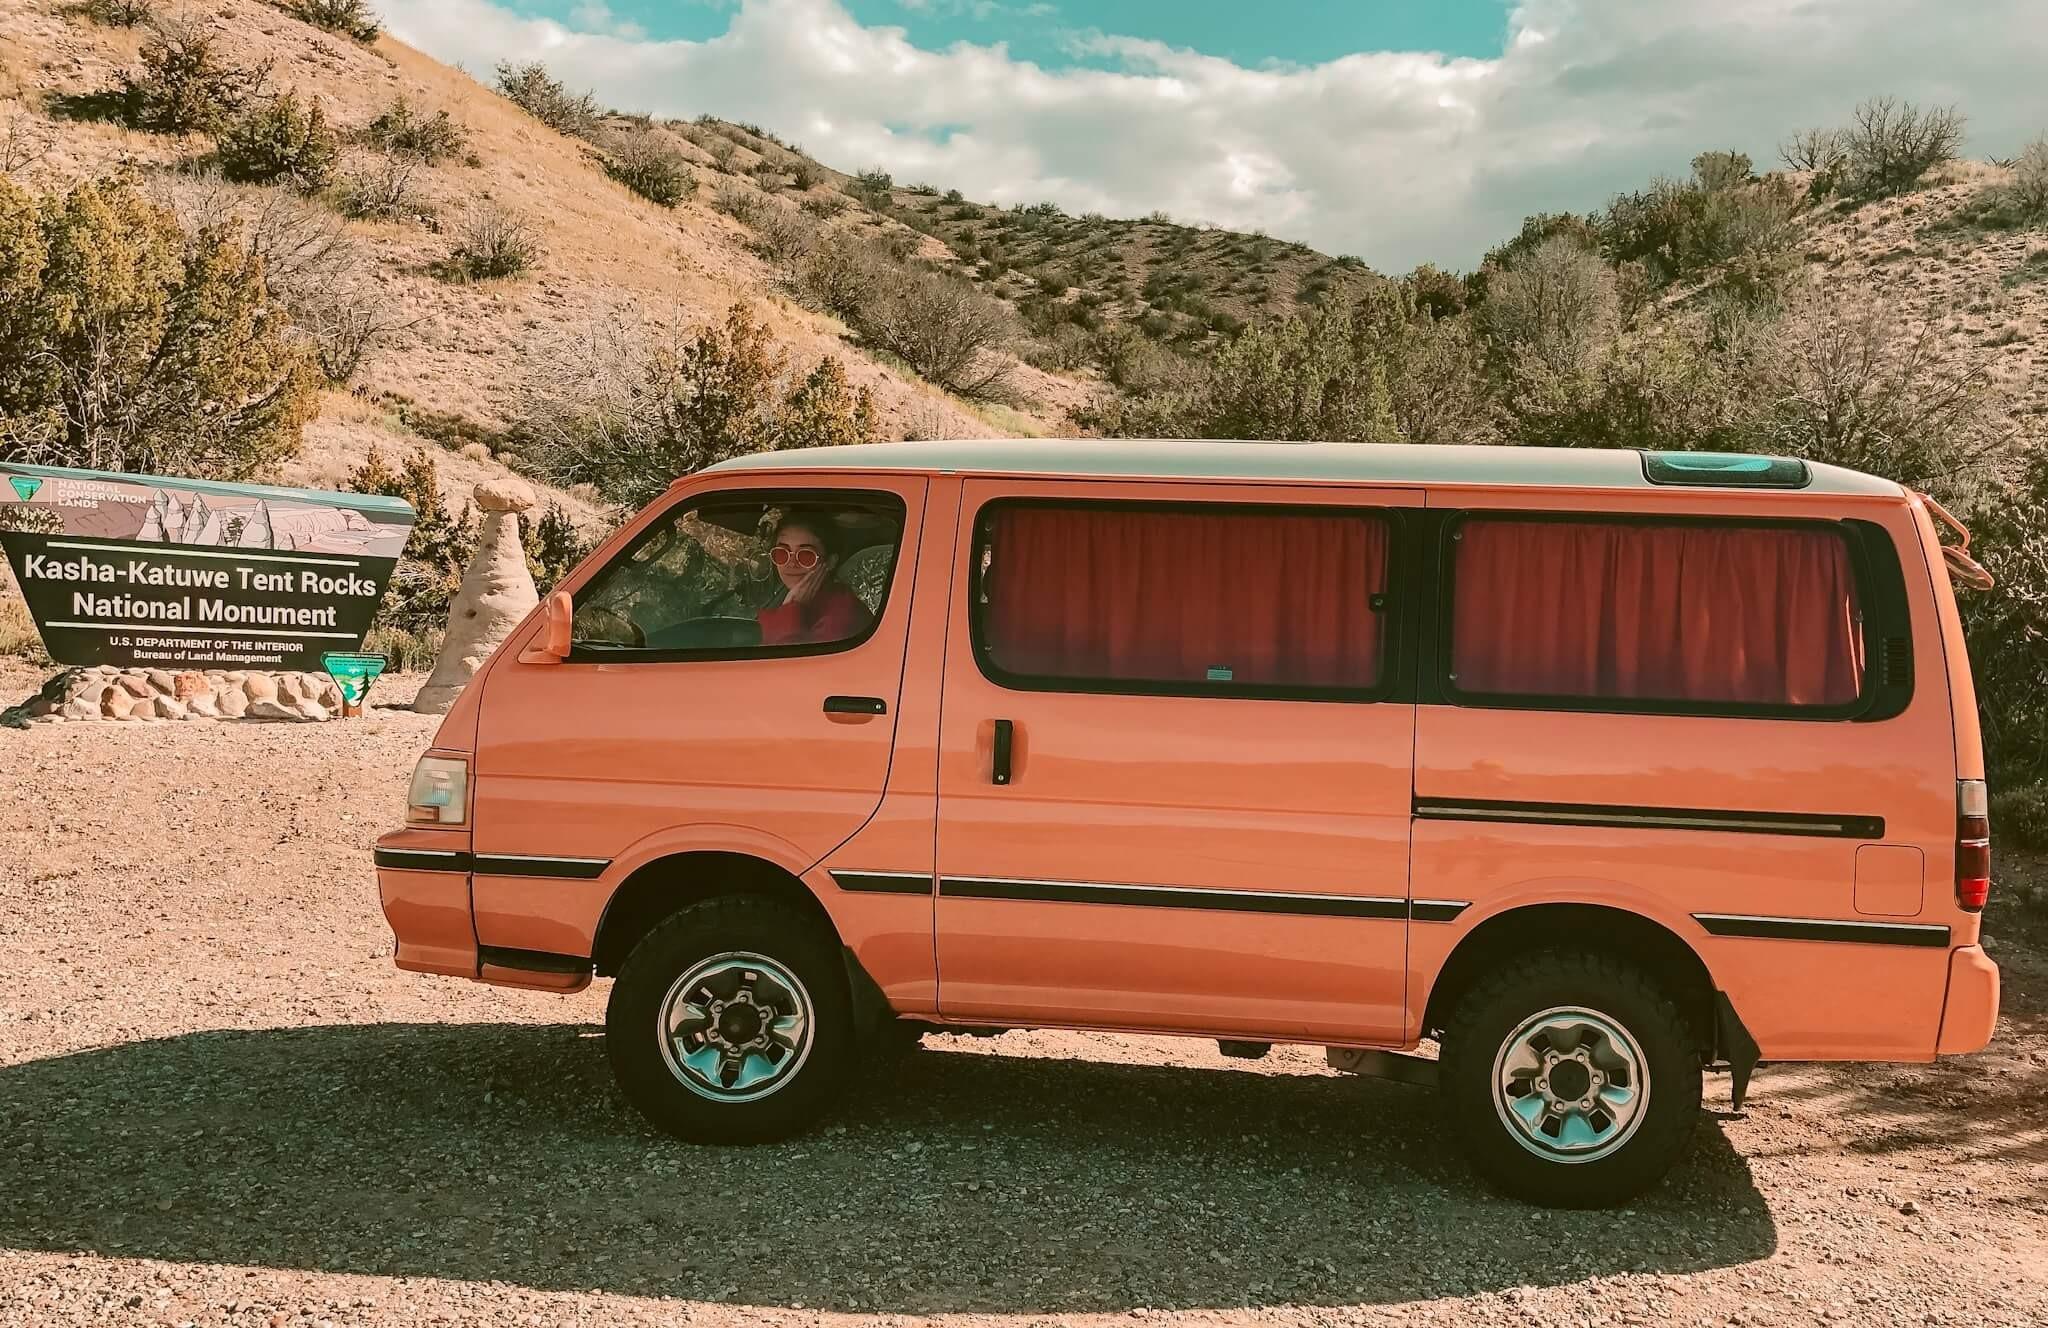 Orange van in front of Kasha-Katuwe Tent Rocks National Monument